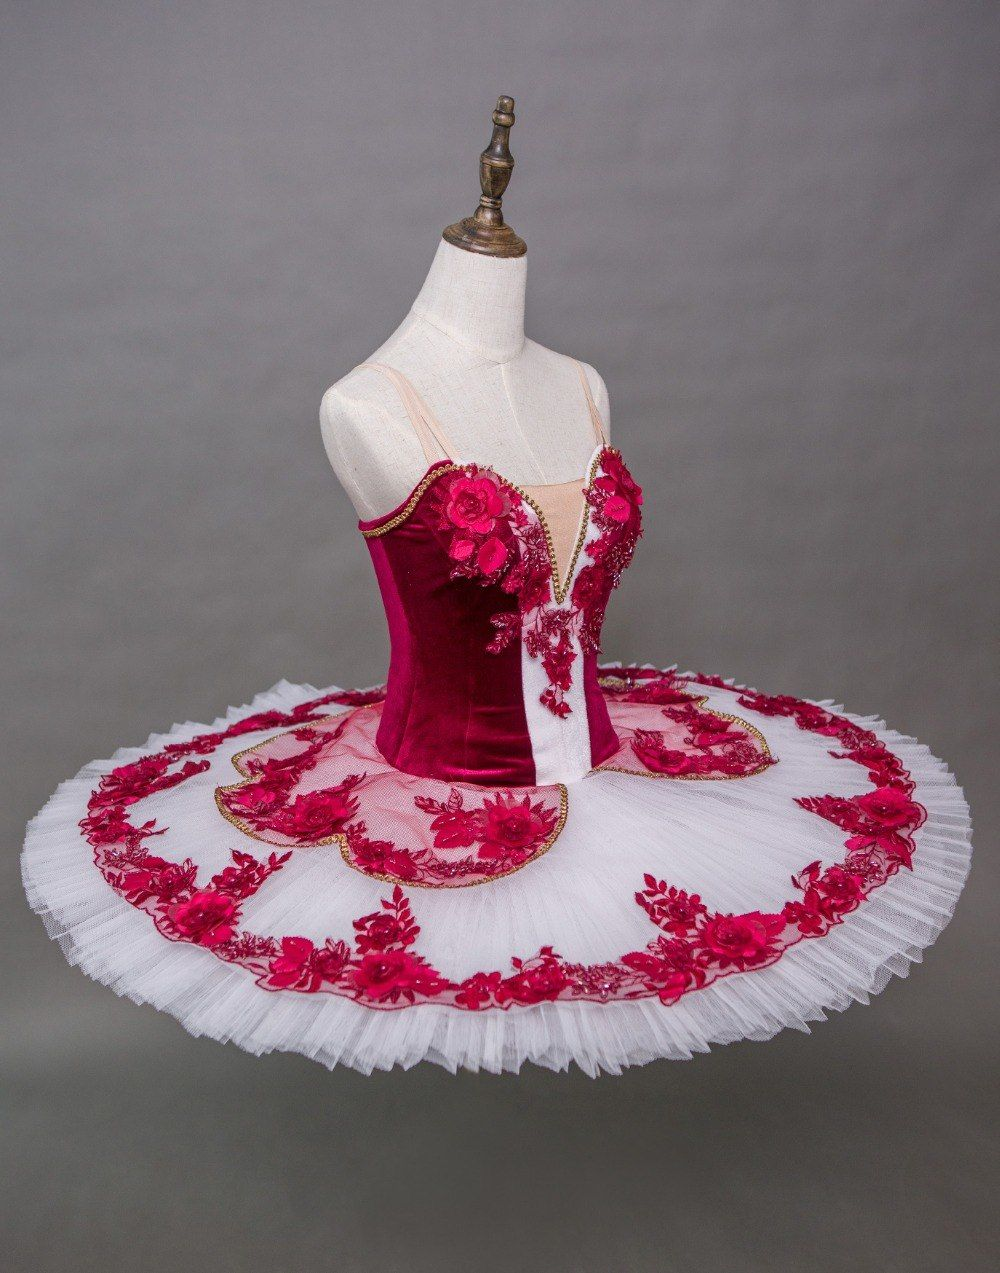 dca53e5ed Adult Professional Ballet Tutus Women Coppelia Classical Ballet Tutu  Pancake Tutu Dress red Paquita, Kitri Paquita Don Quixote